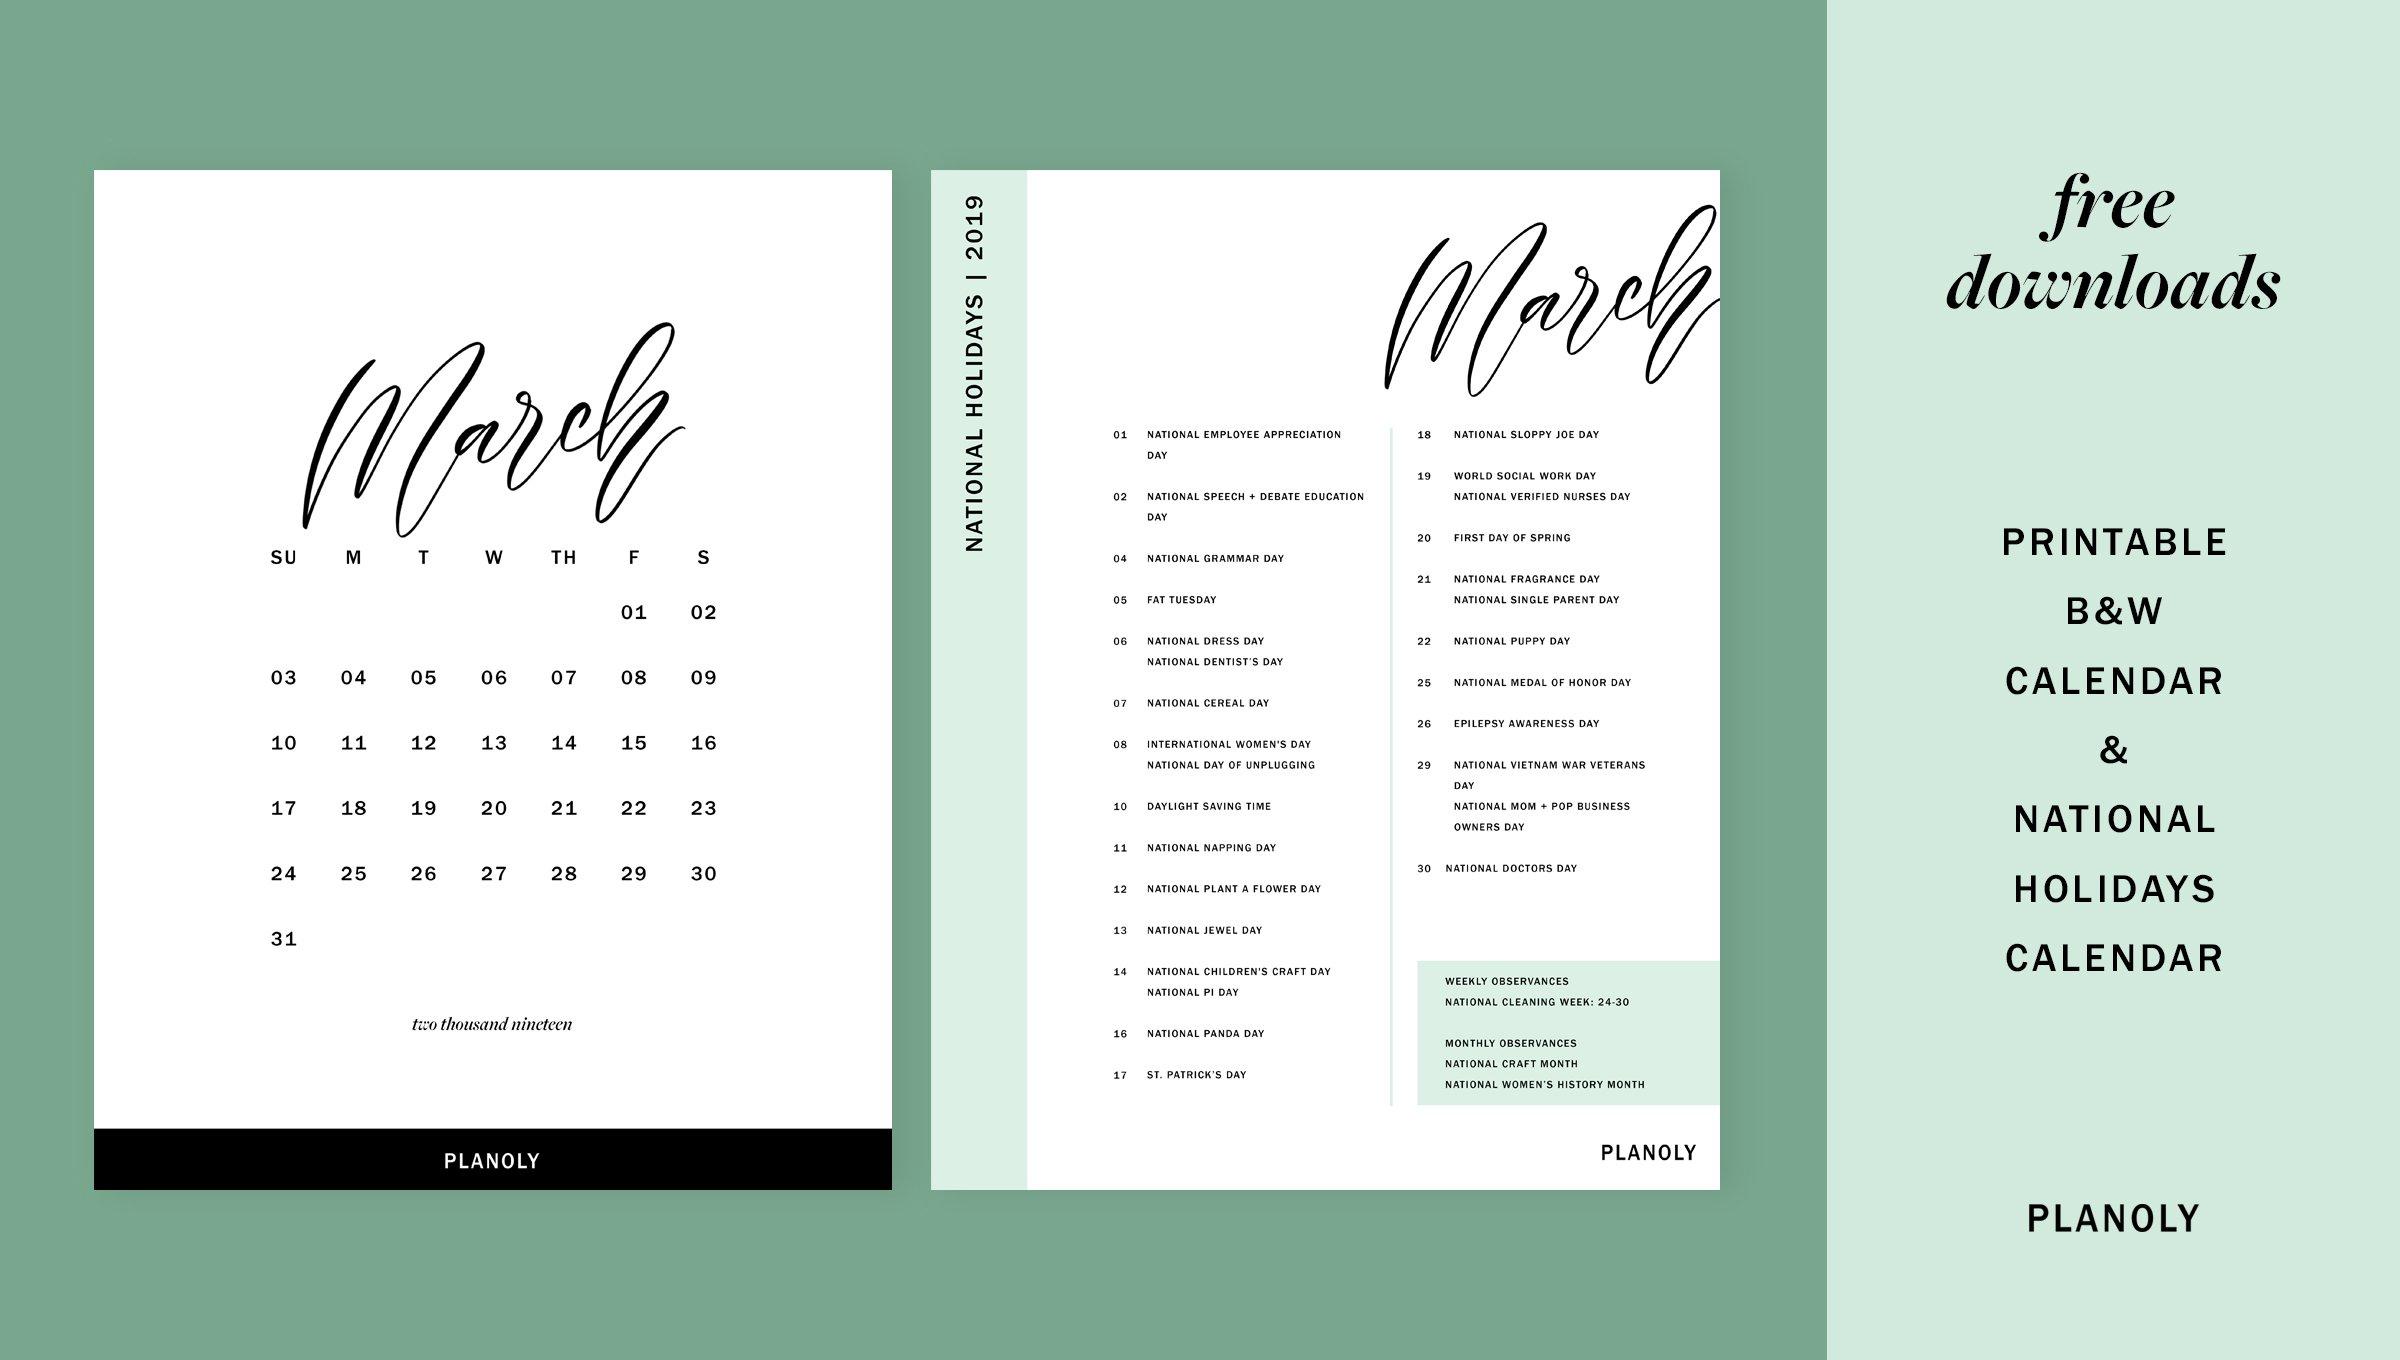 March 2019 – Blog Post – Image 2 – Planoly Calendar 2019 Blog